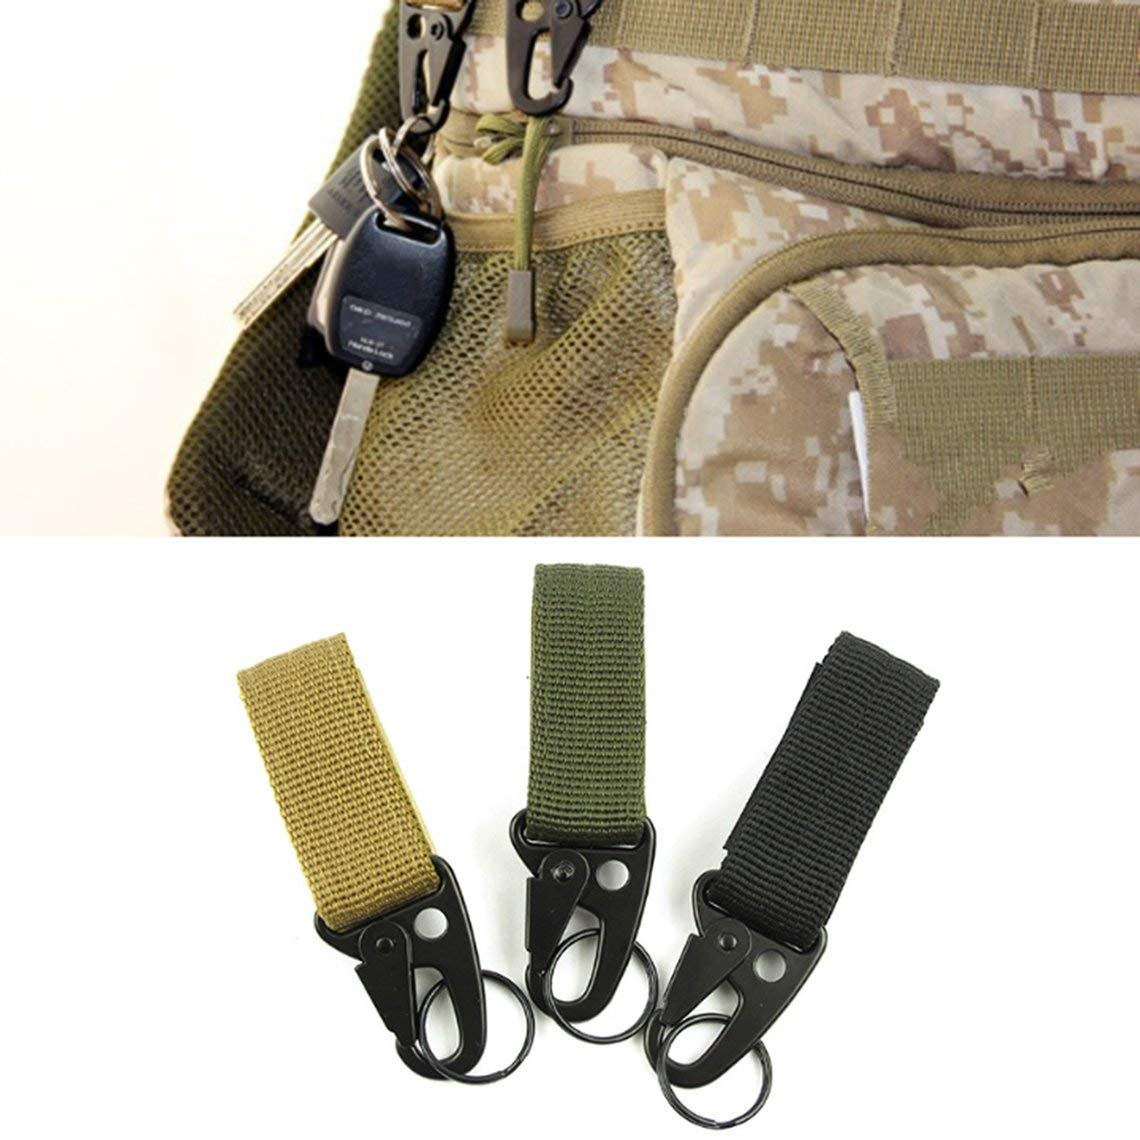 Zinniaya Outdoor Nylon Key Hook Webbing Buckle Hanging Belt Carabiner Clip Multifunctional Camping Climbing Hiking Equipment Buckles